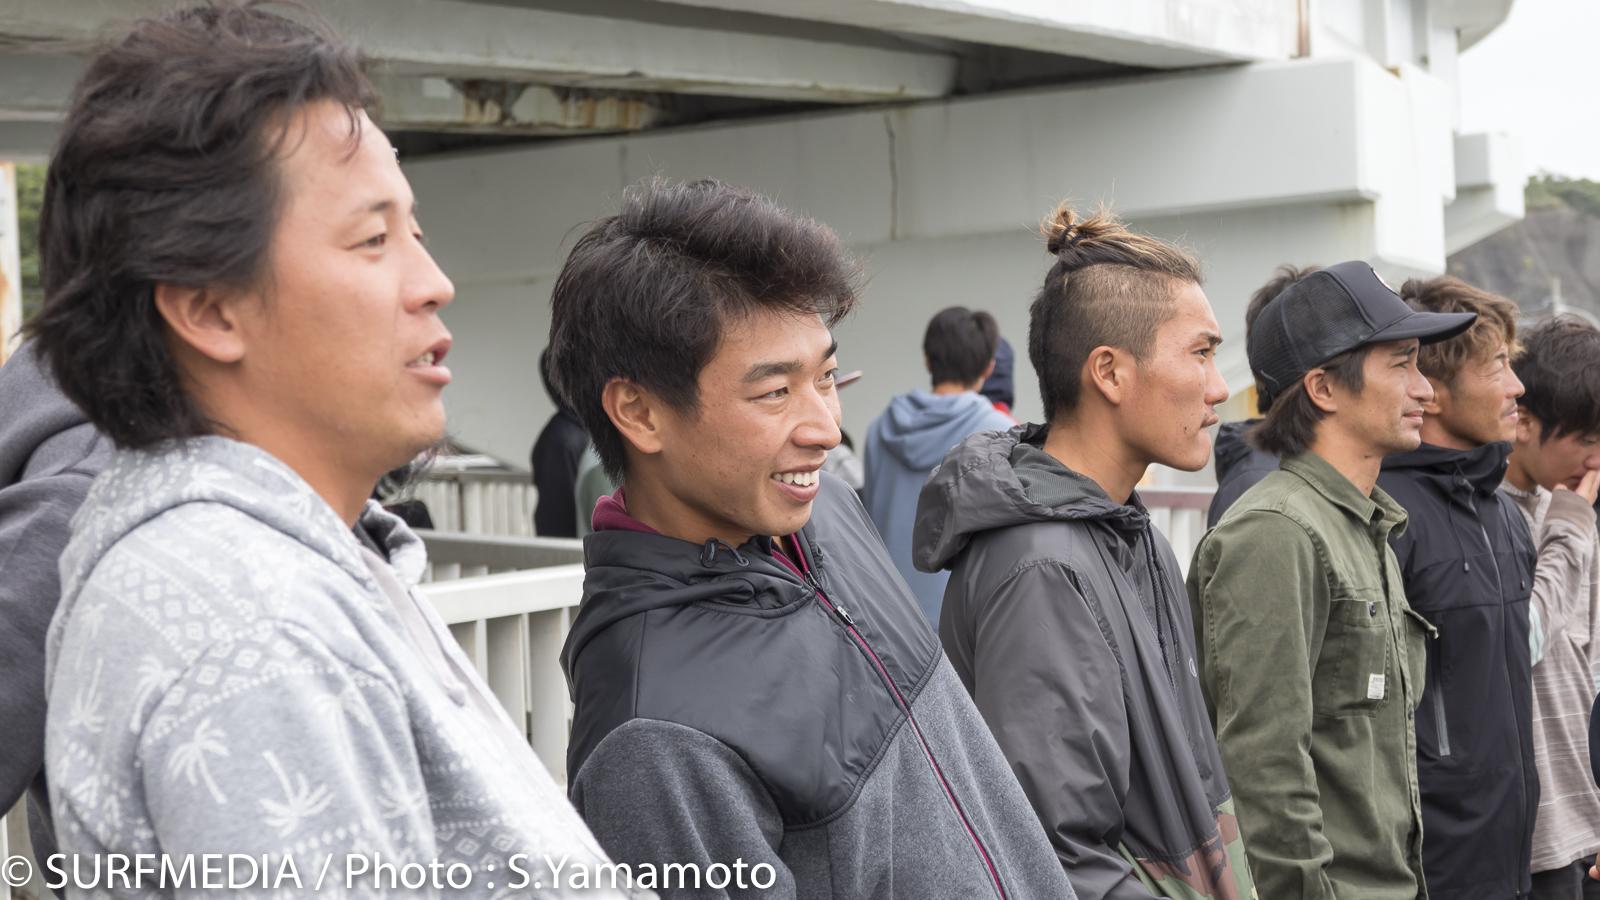 kenta kashu taichi naofumi naohisa-9020361